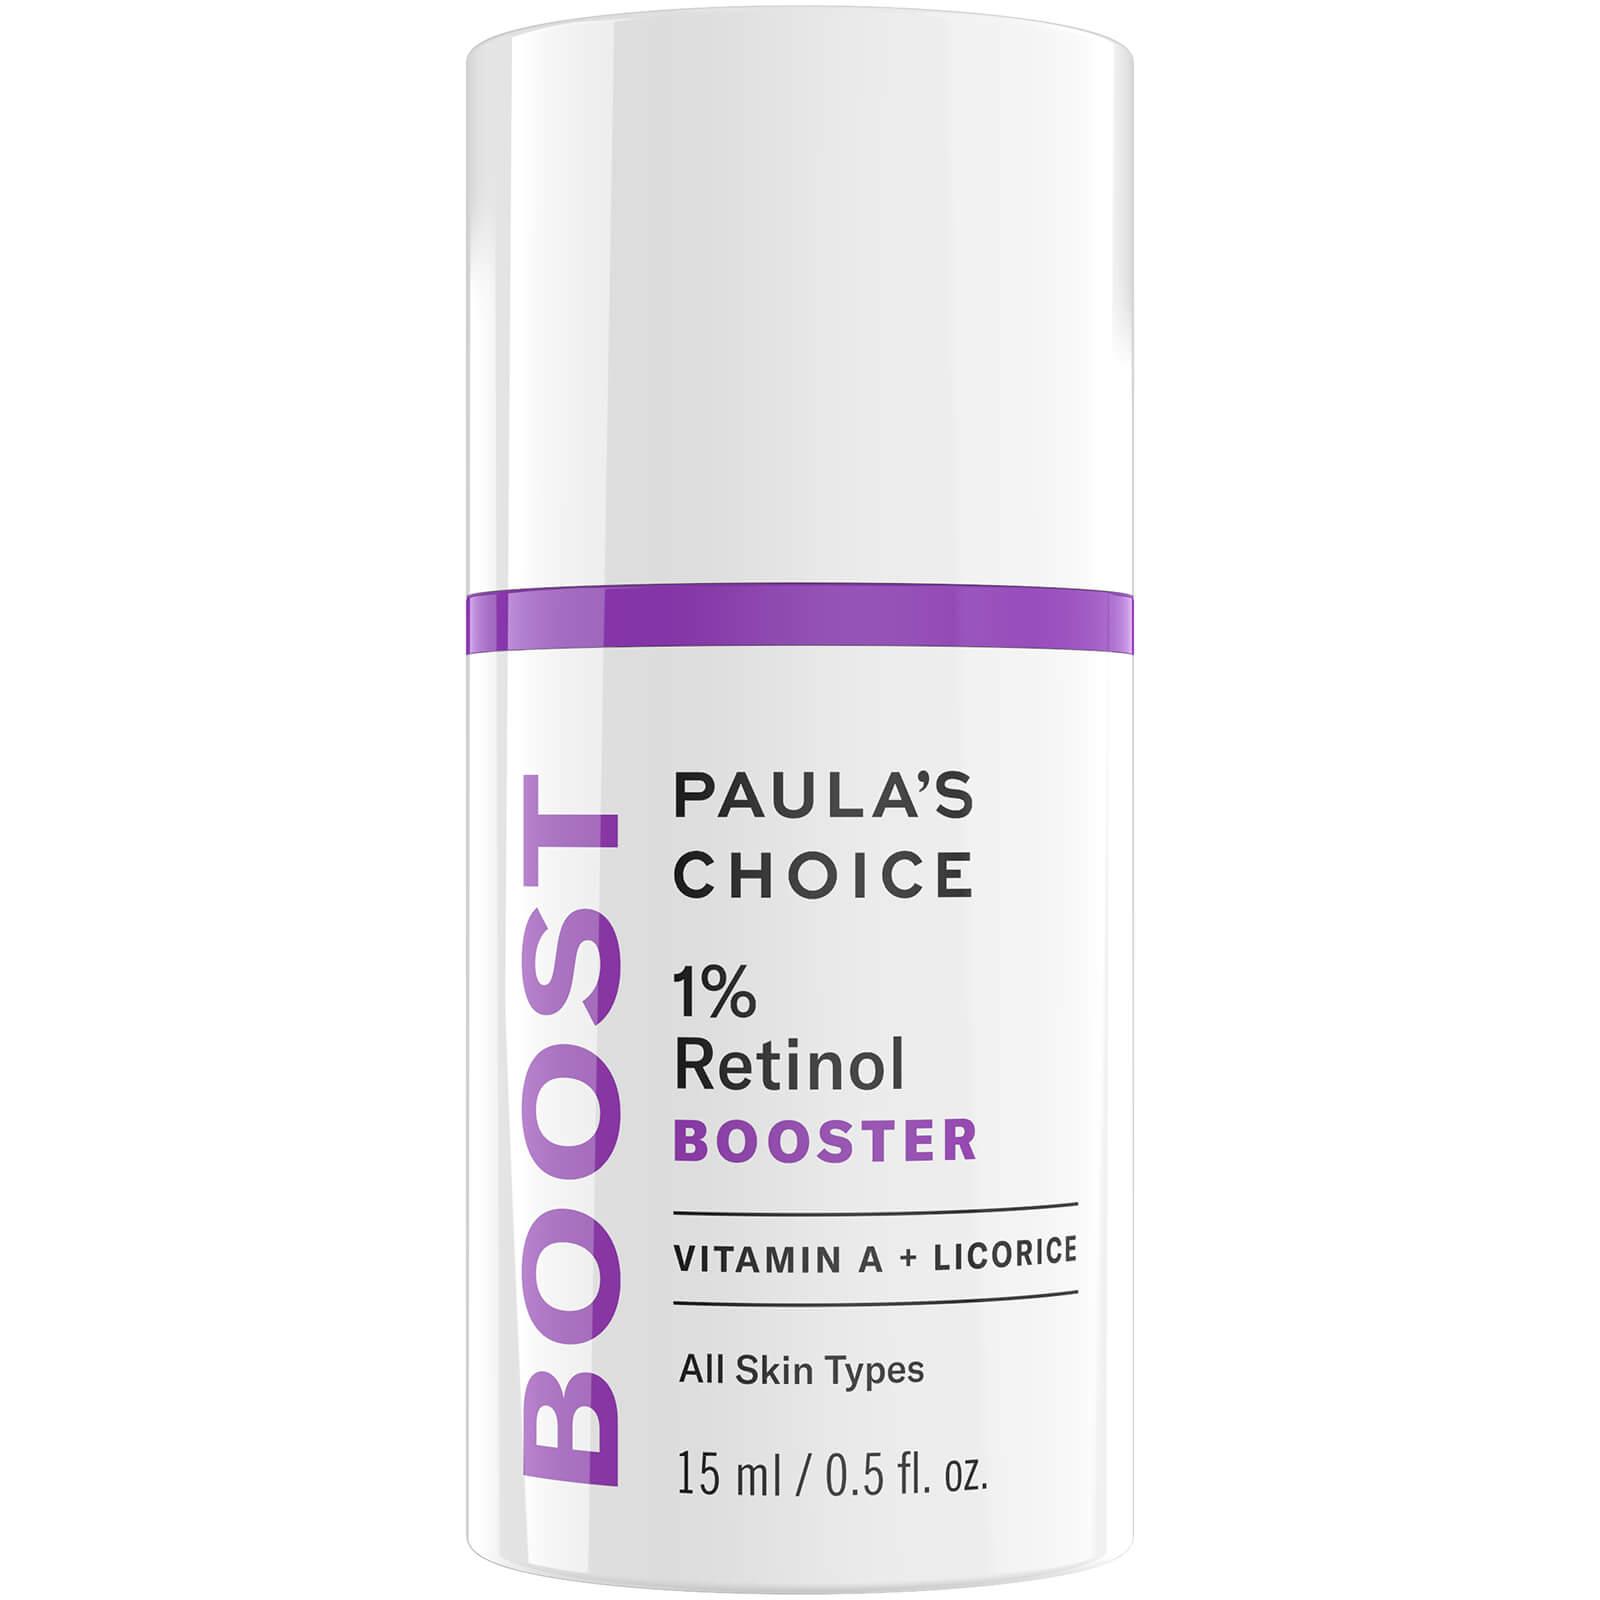 Paula's Choice 1% Retinol Booster (15ml)